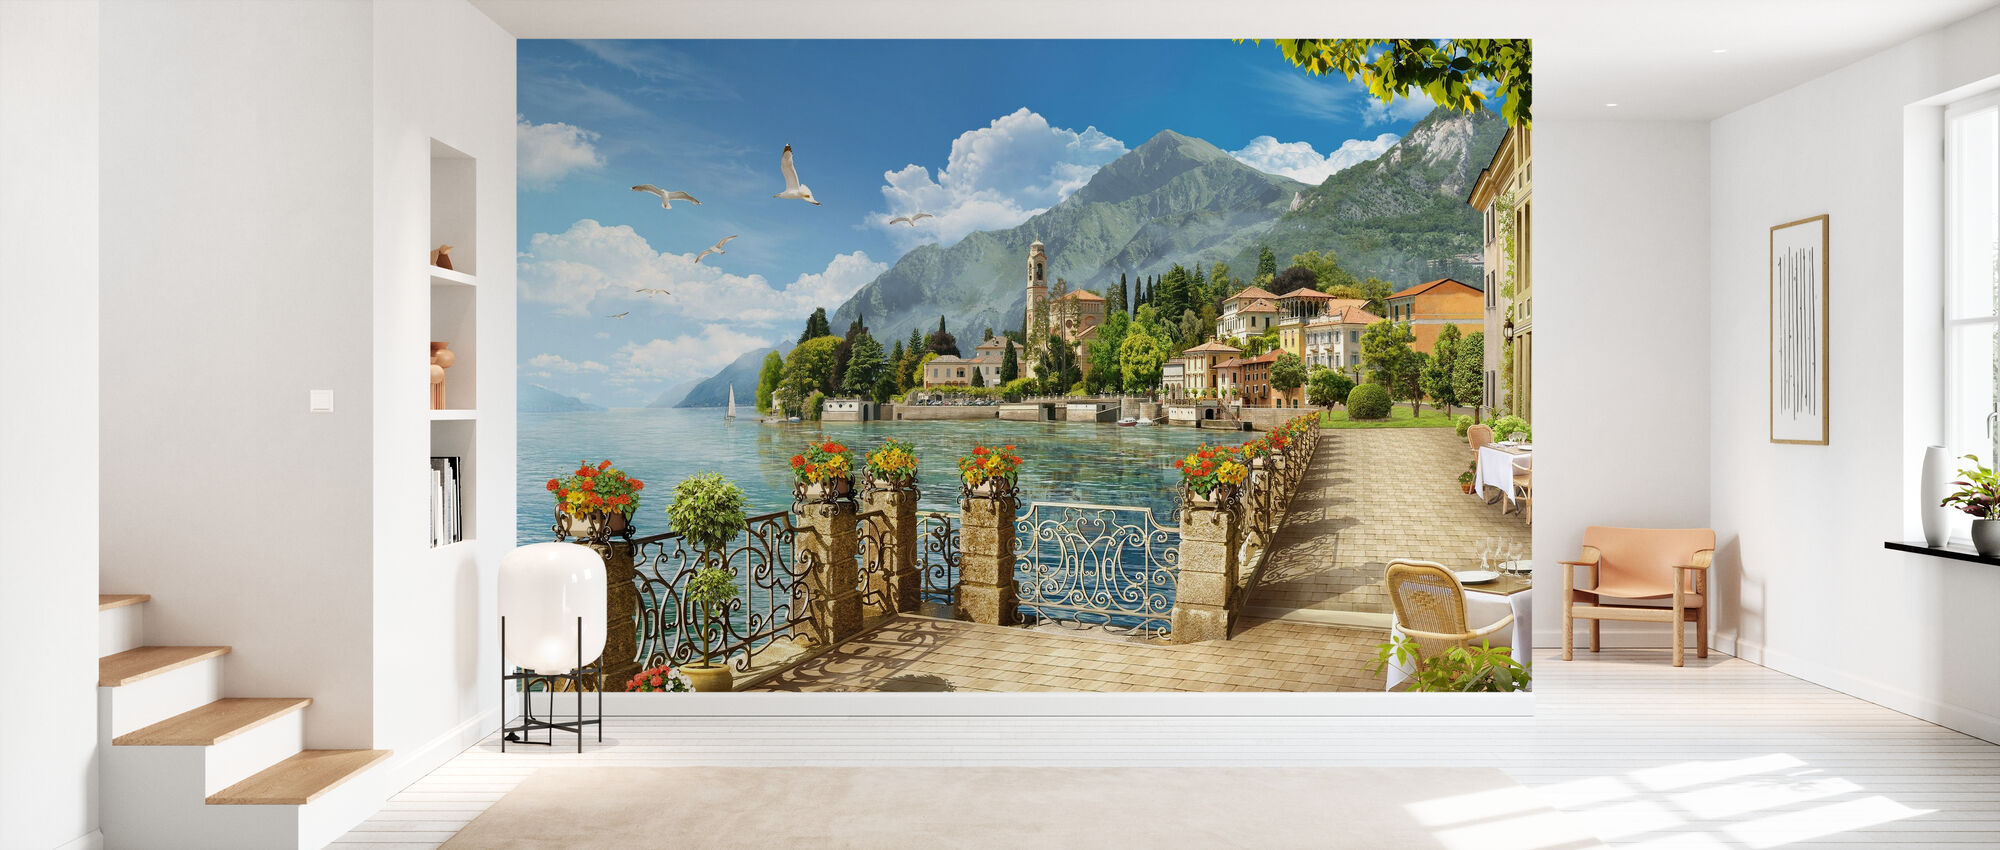 Lake Como - Italy - Wallpaper - Hallway